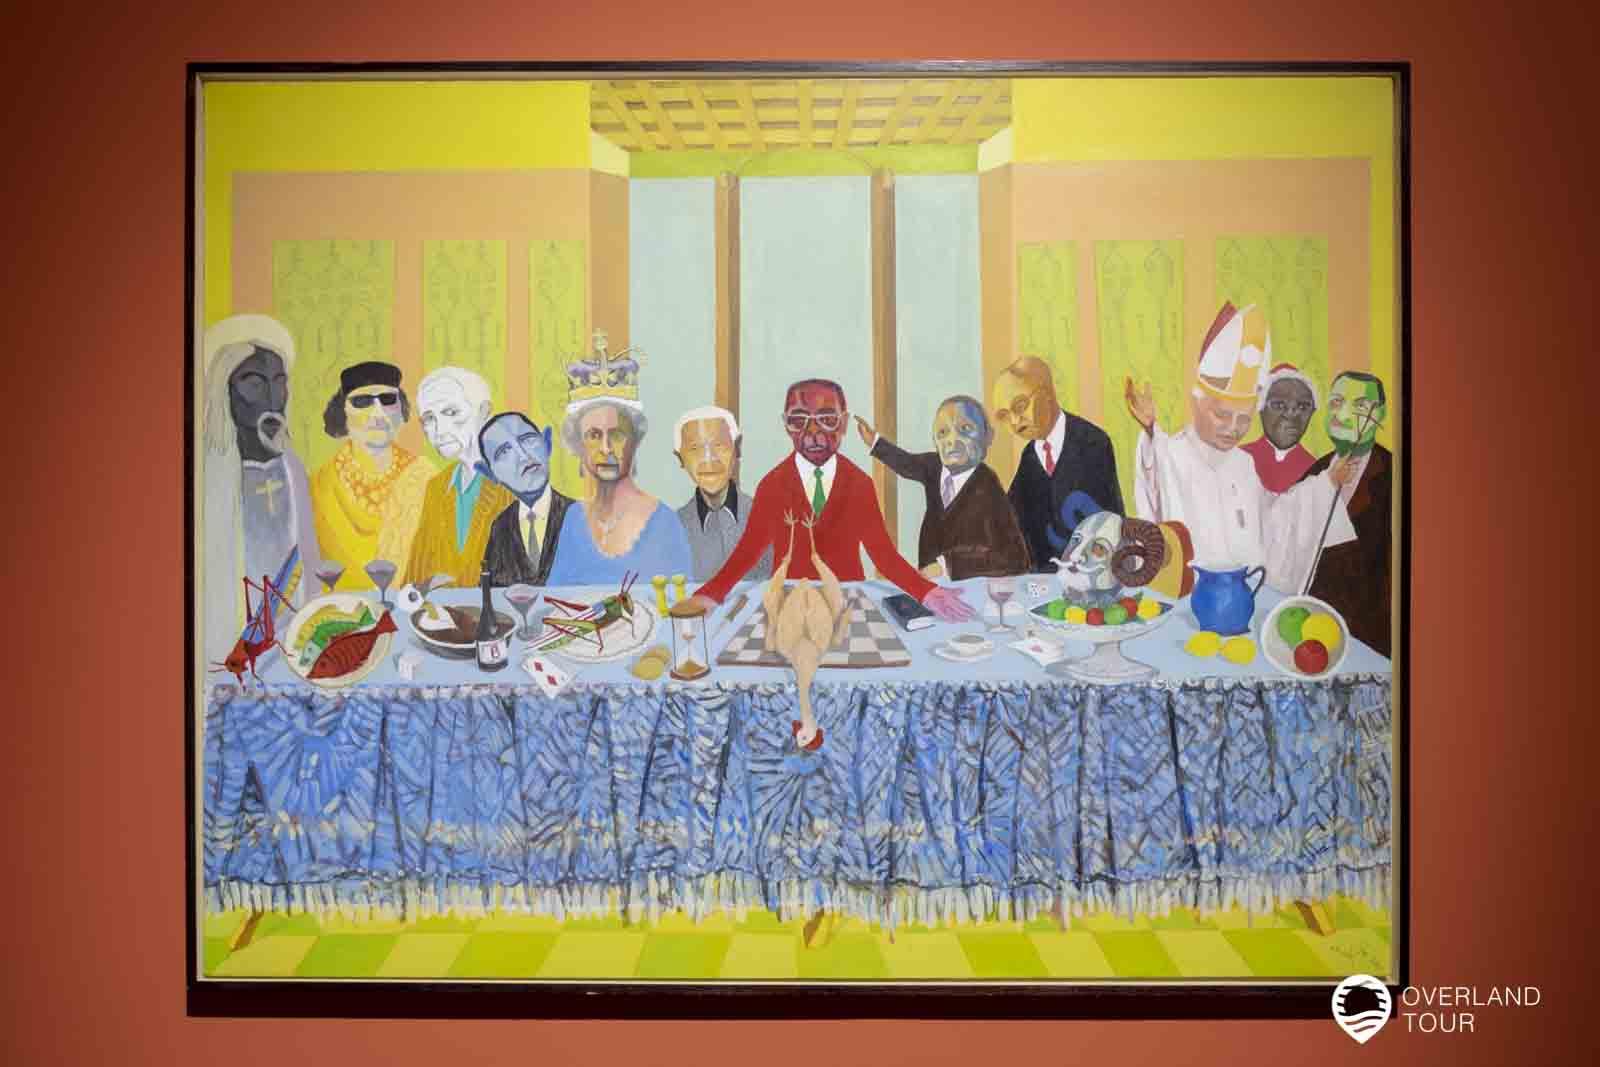 Das ZEITS MOCCA - Museum of Contemporary Art Africa - in Kapstad